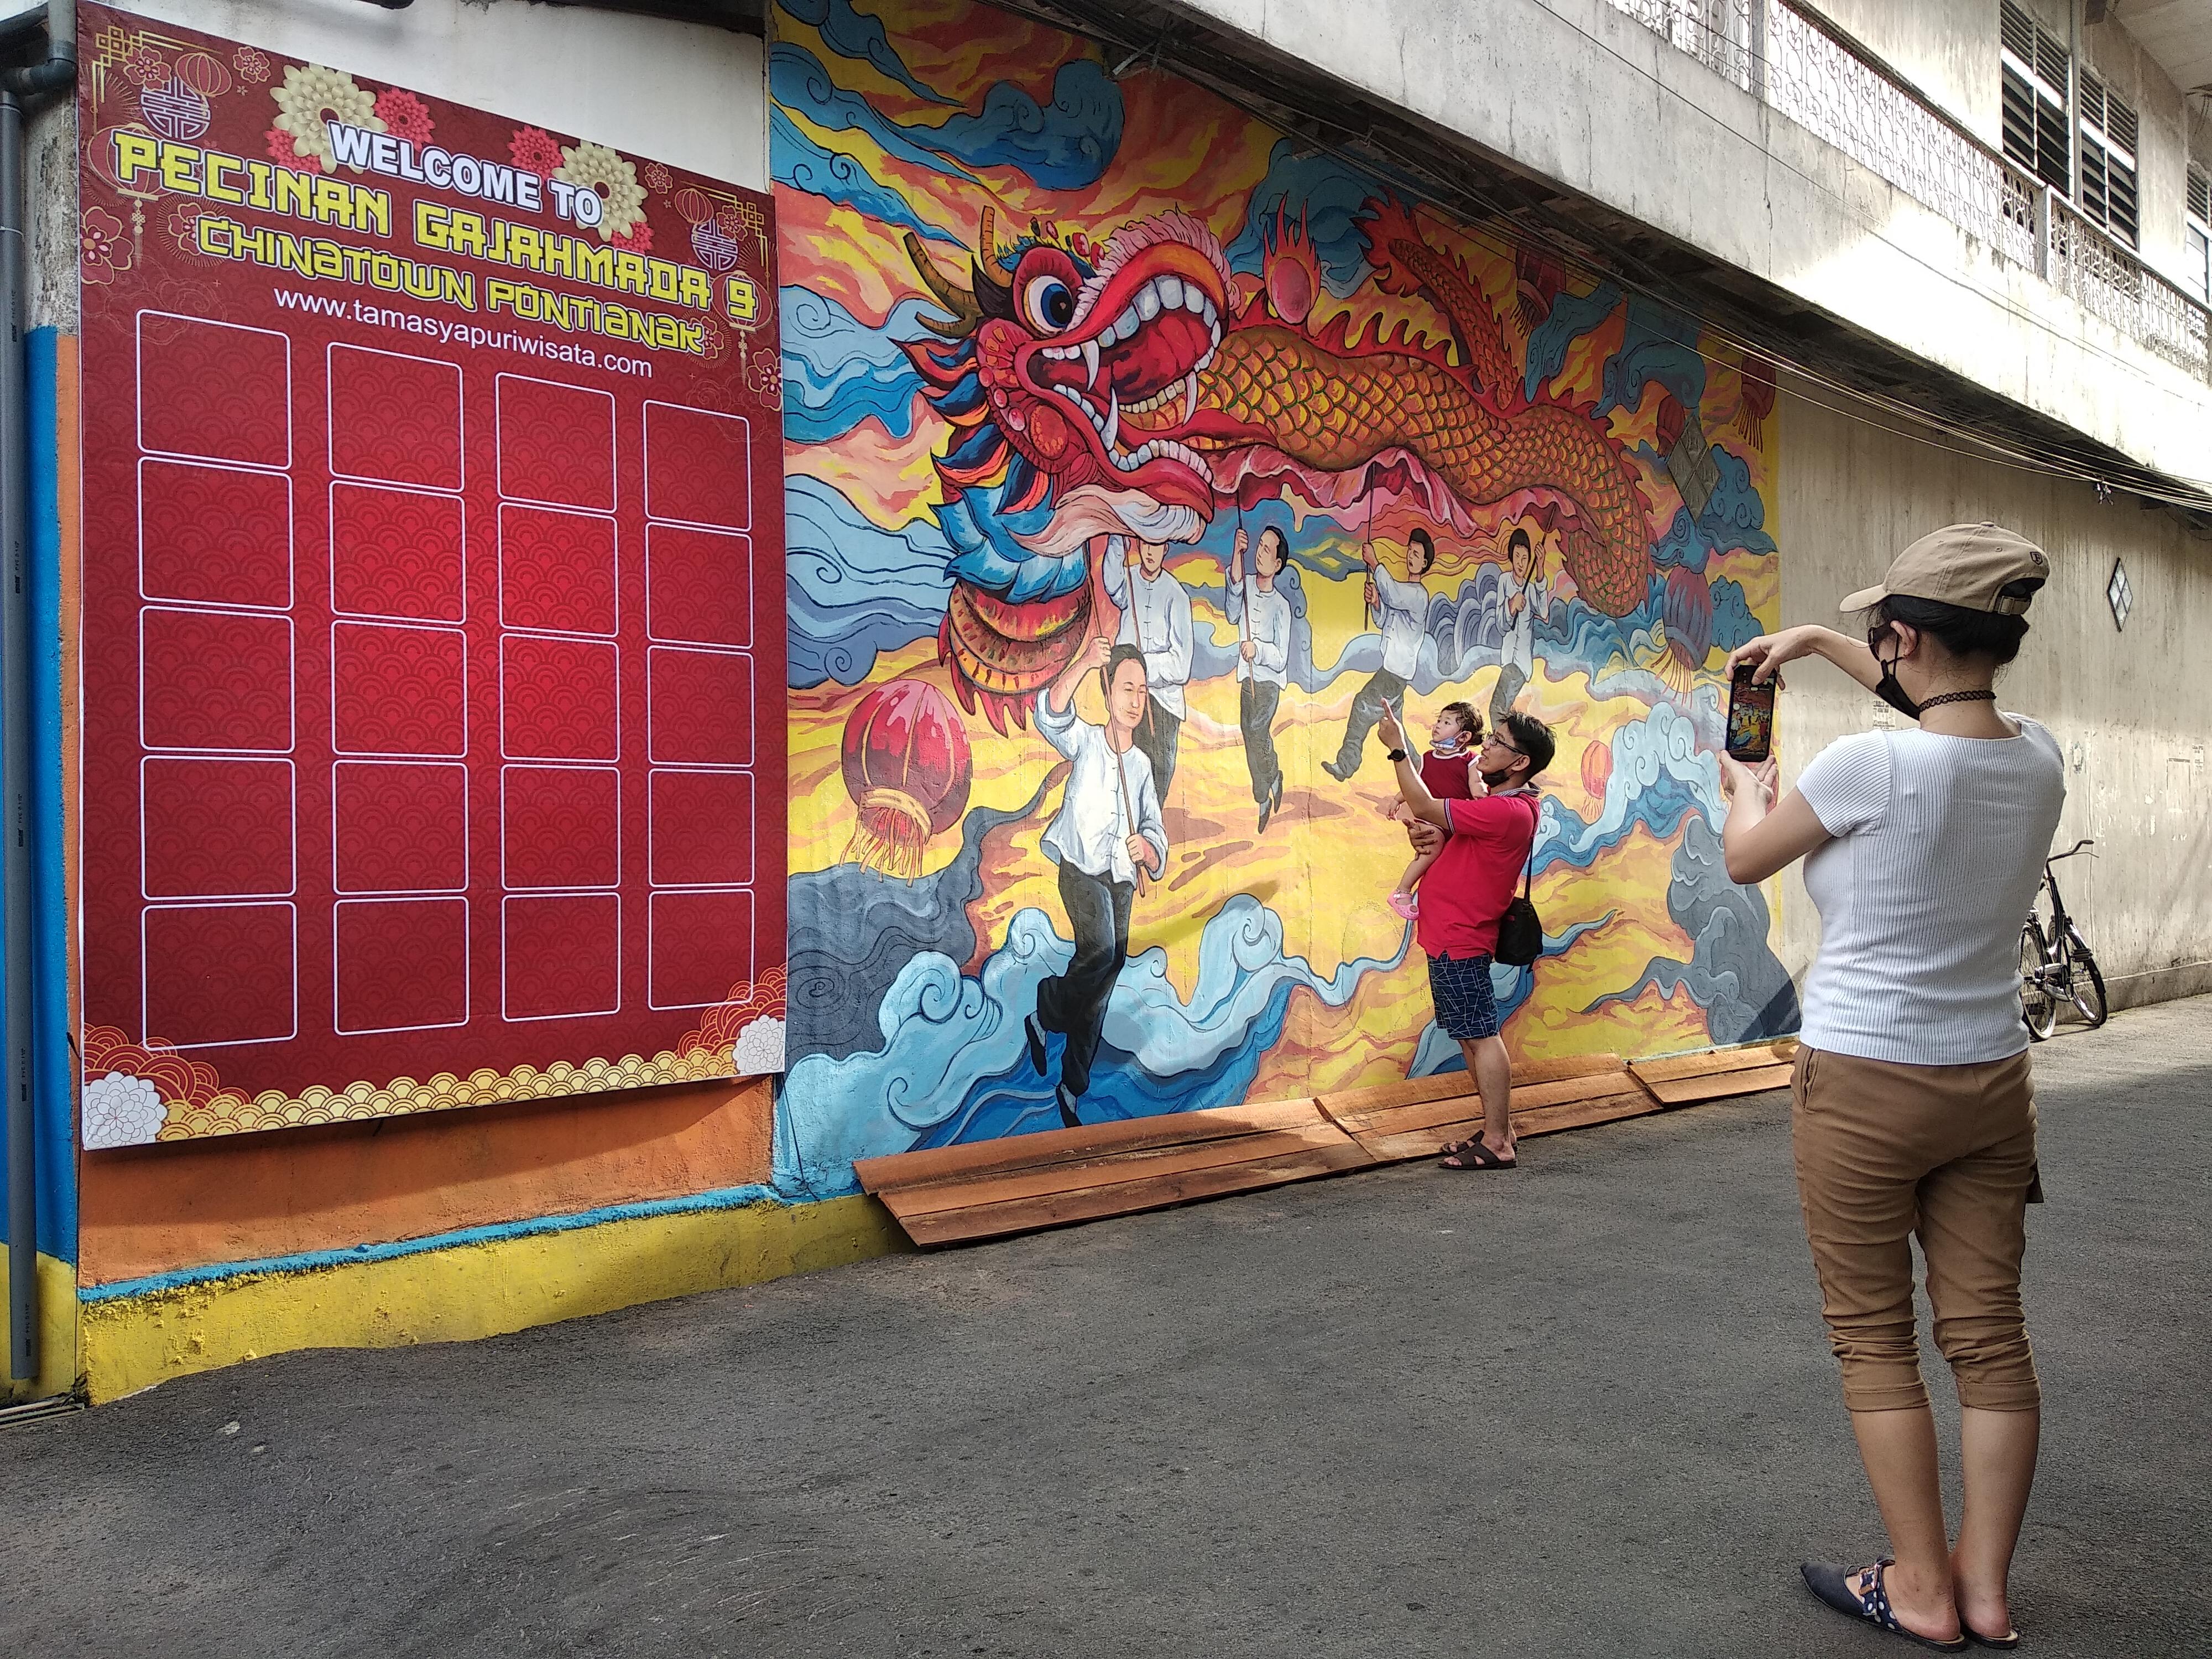 Pecinan Gajahmada 9 - Chinatown Pontianak